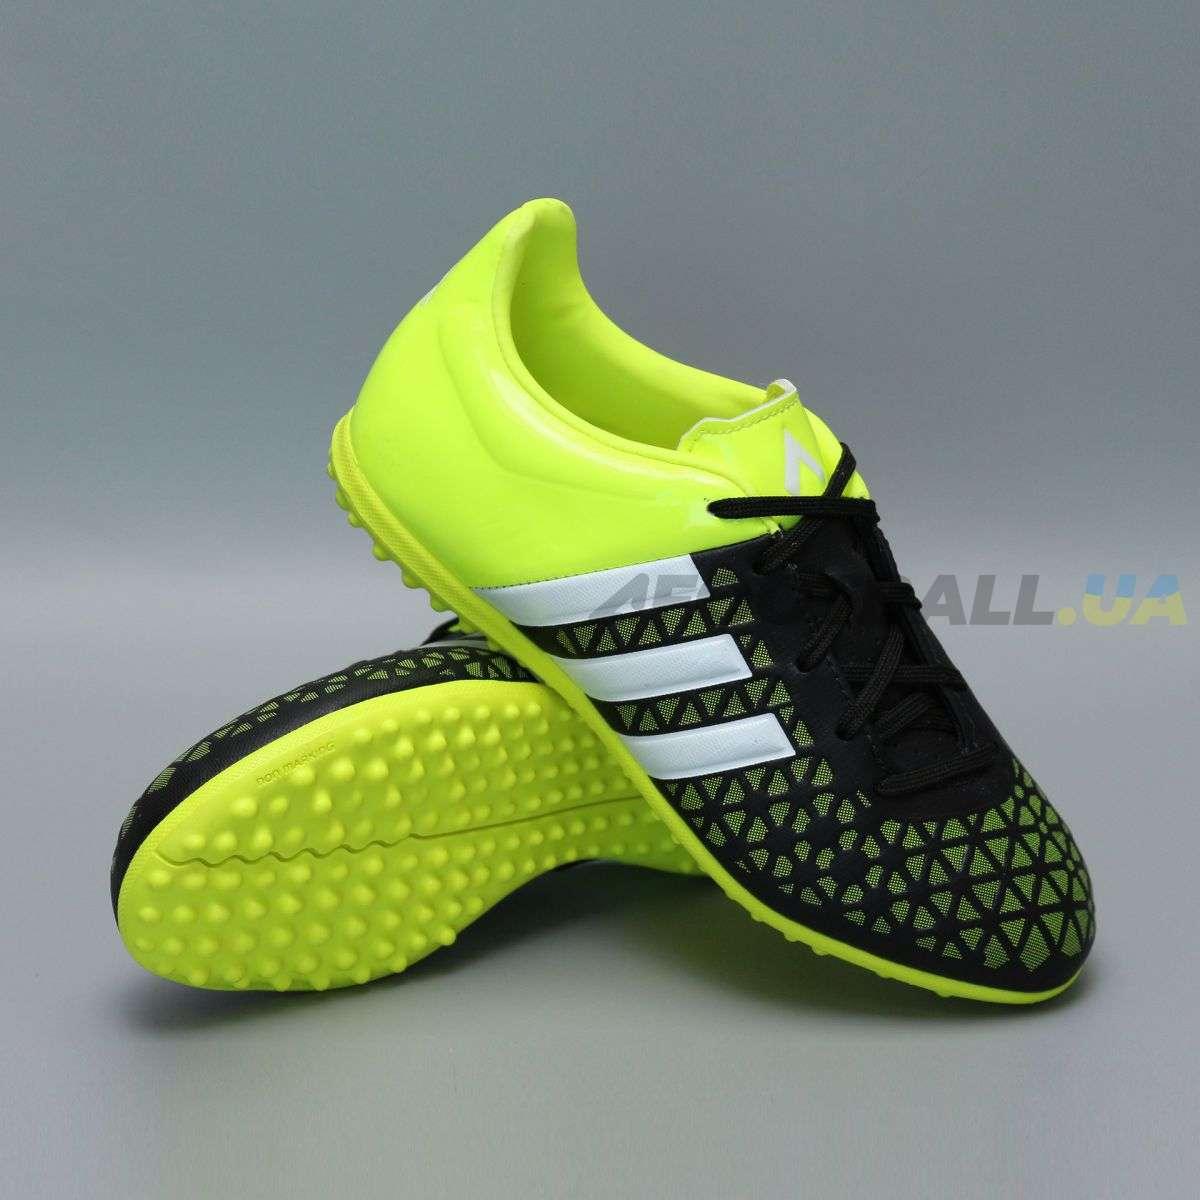 online retailer c8a6f a5242 Детские сороконожки ADIDAS ACE 15.3 TF B27035 JR black ...